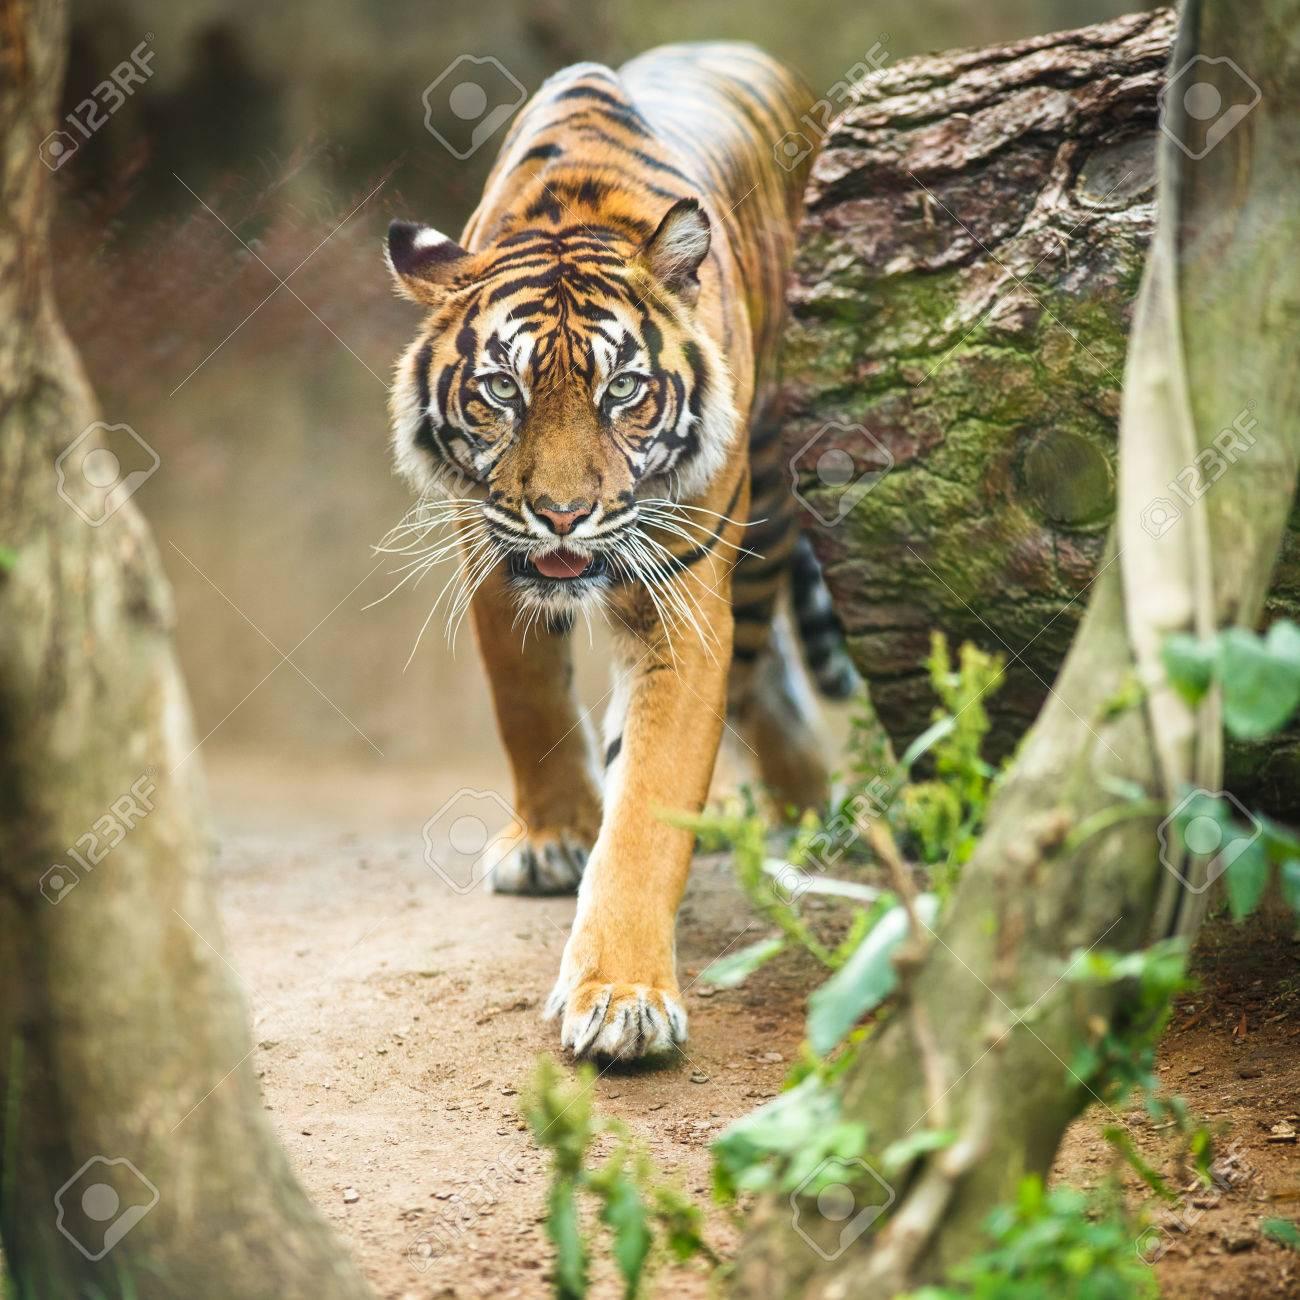 Closeup of a Siberian tiger also know as Amur tiger (Panthera tigris altaica), the largest living cat Standard-Bild - 46142085